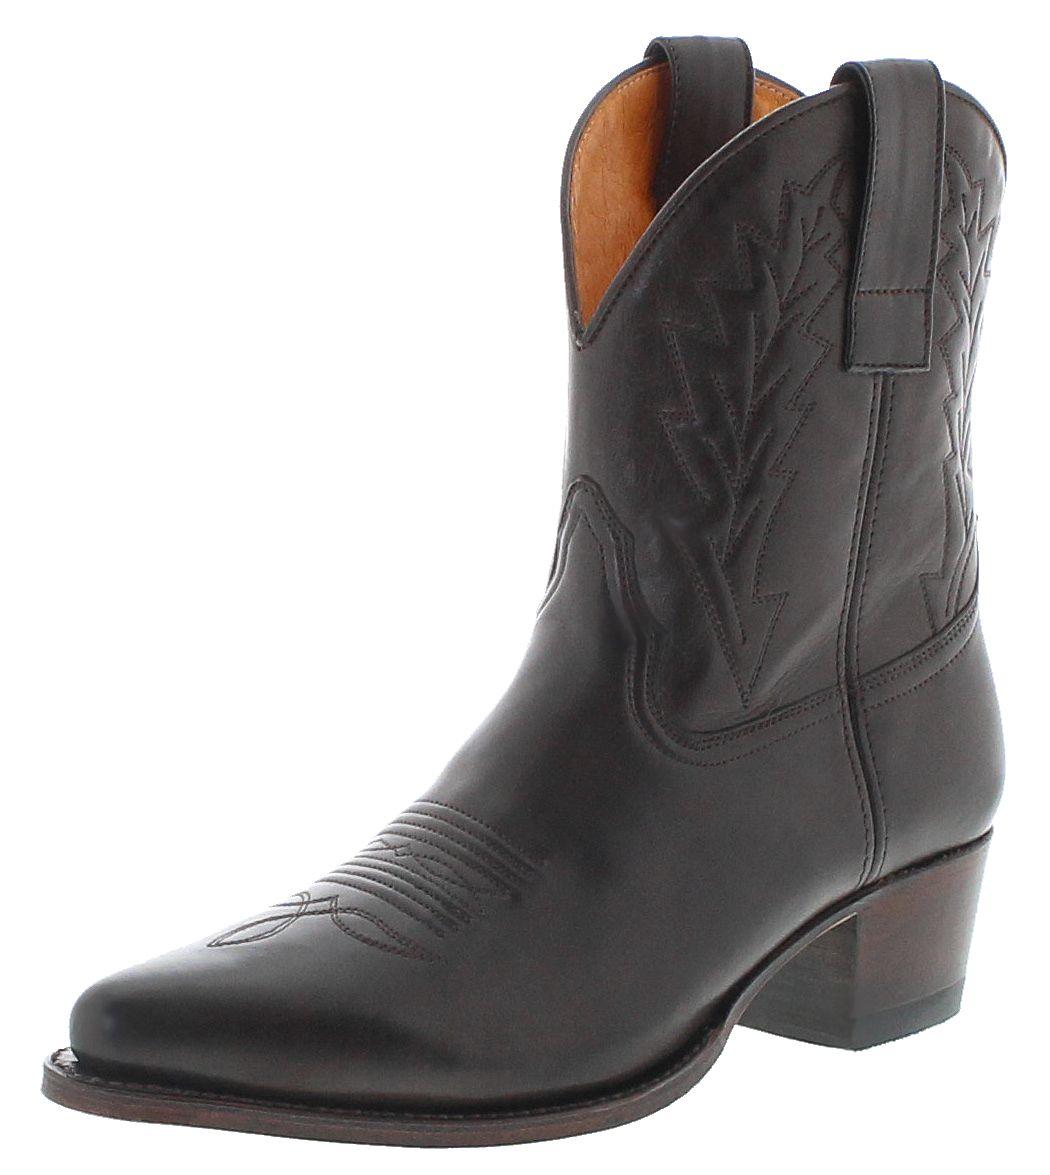 Sendra Boots 16367 Marron Ladies Western Stifelette - brown